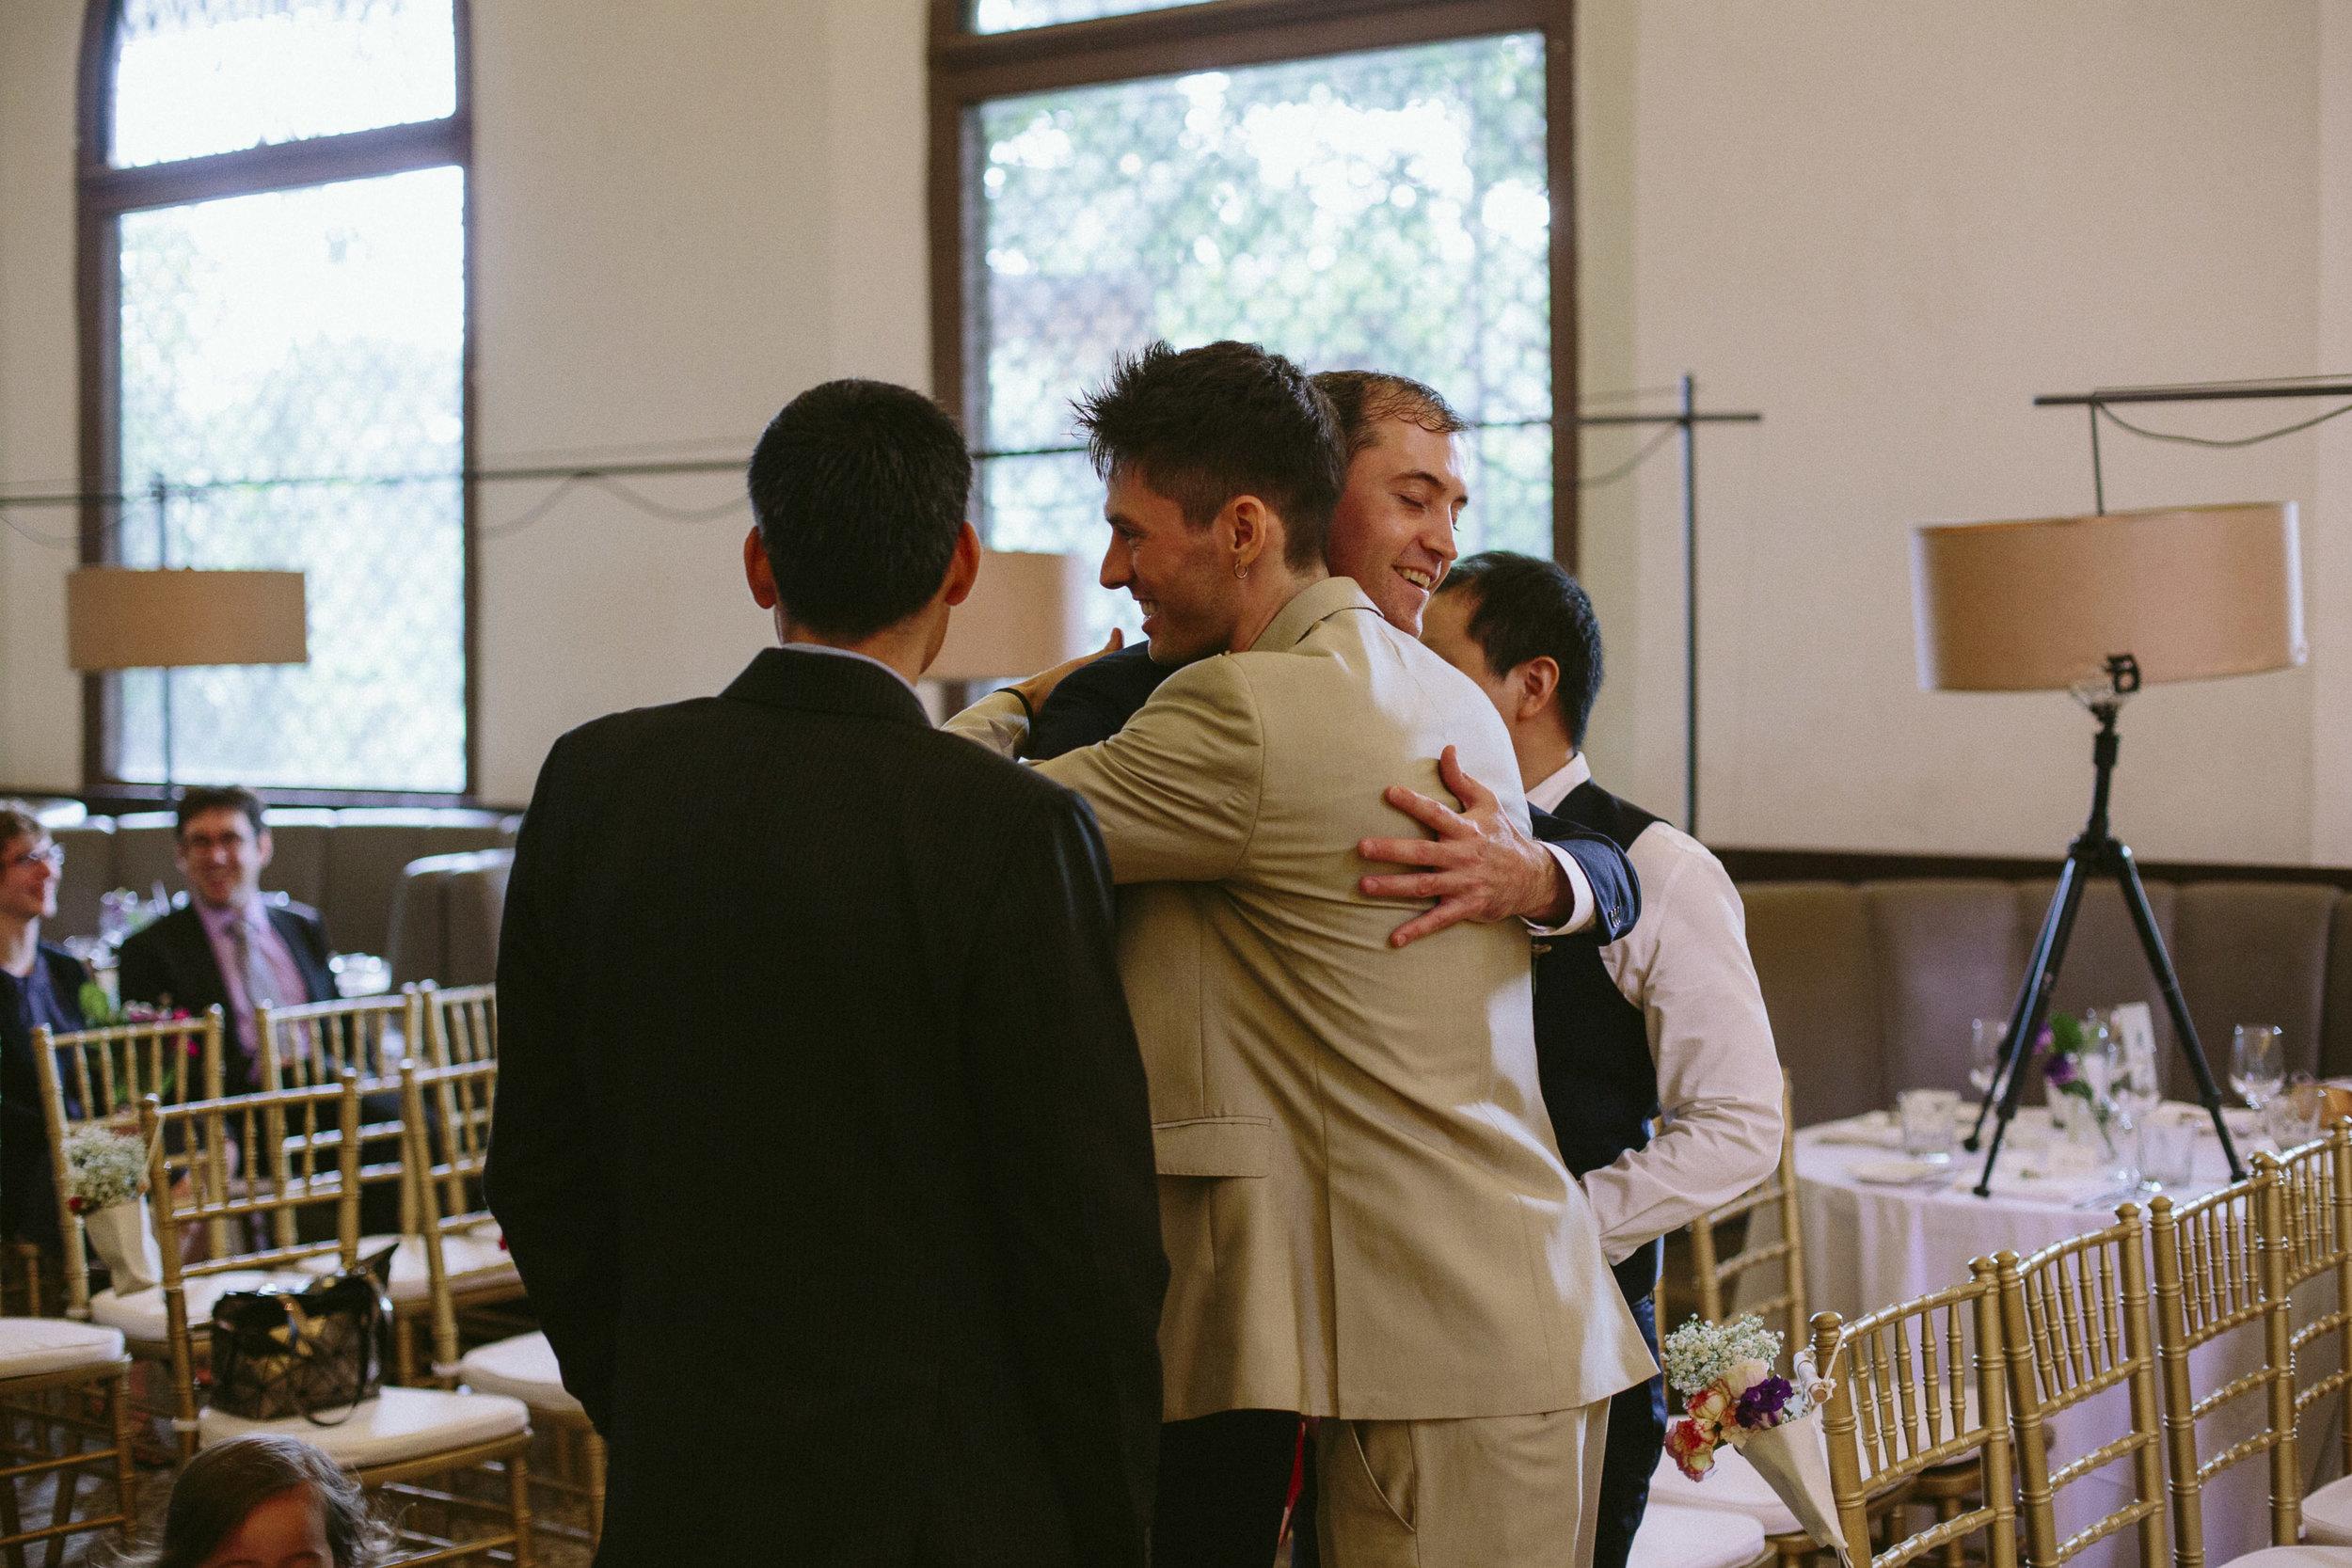 singapore-wedding-photographer-hiram-joyce-027.jpg